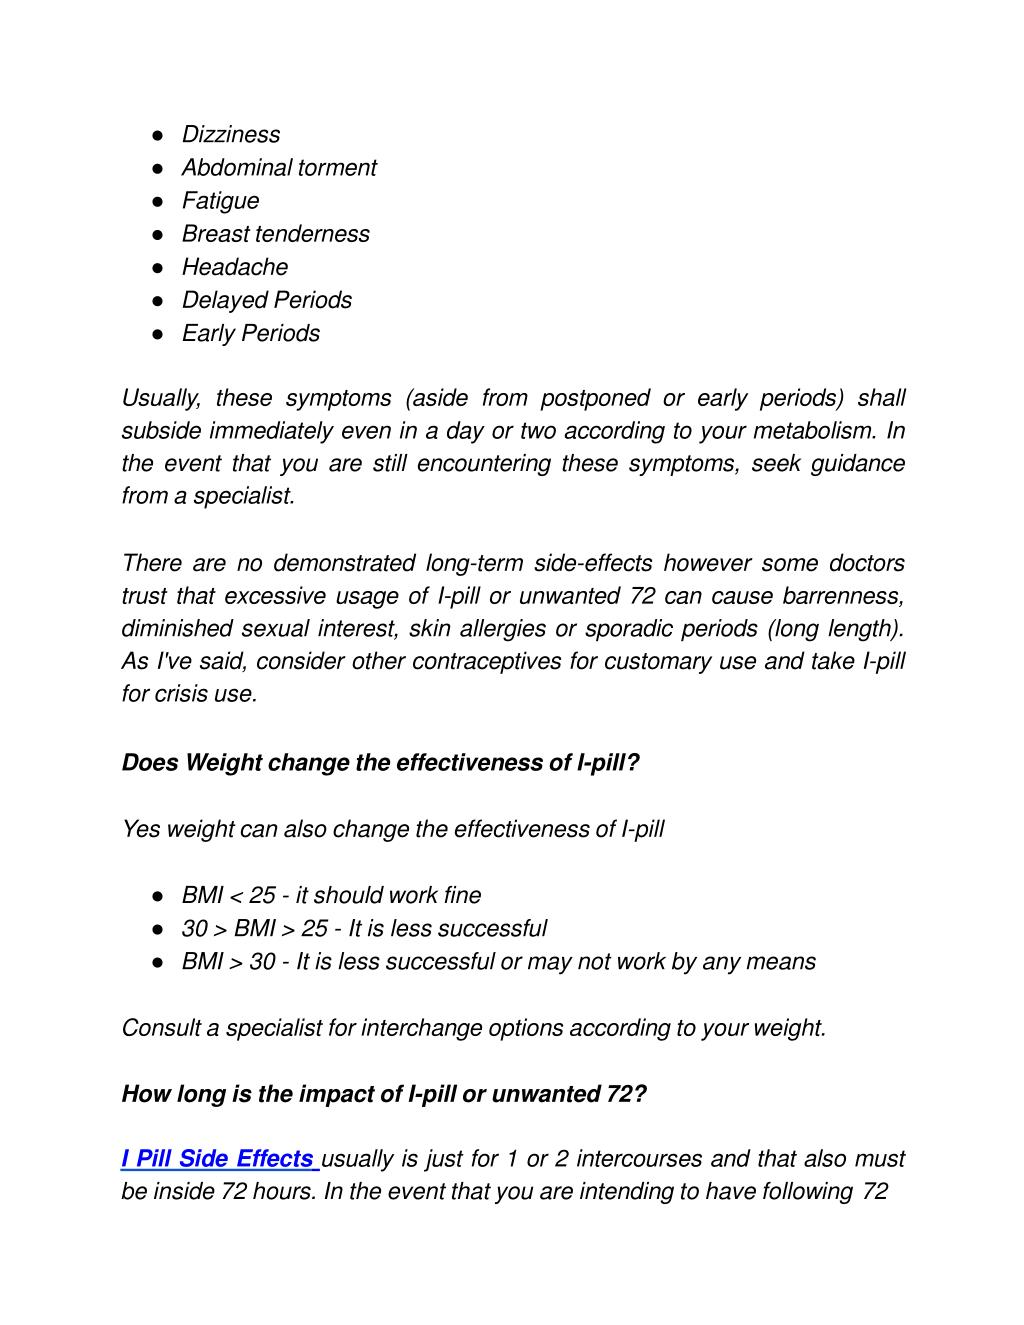 PPT - I Pill 72 | Birth Control Pills | Elawoman PowerPoint